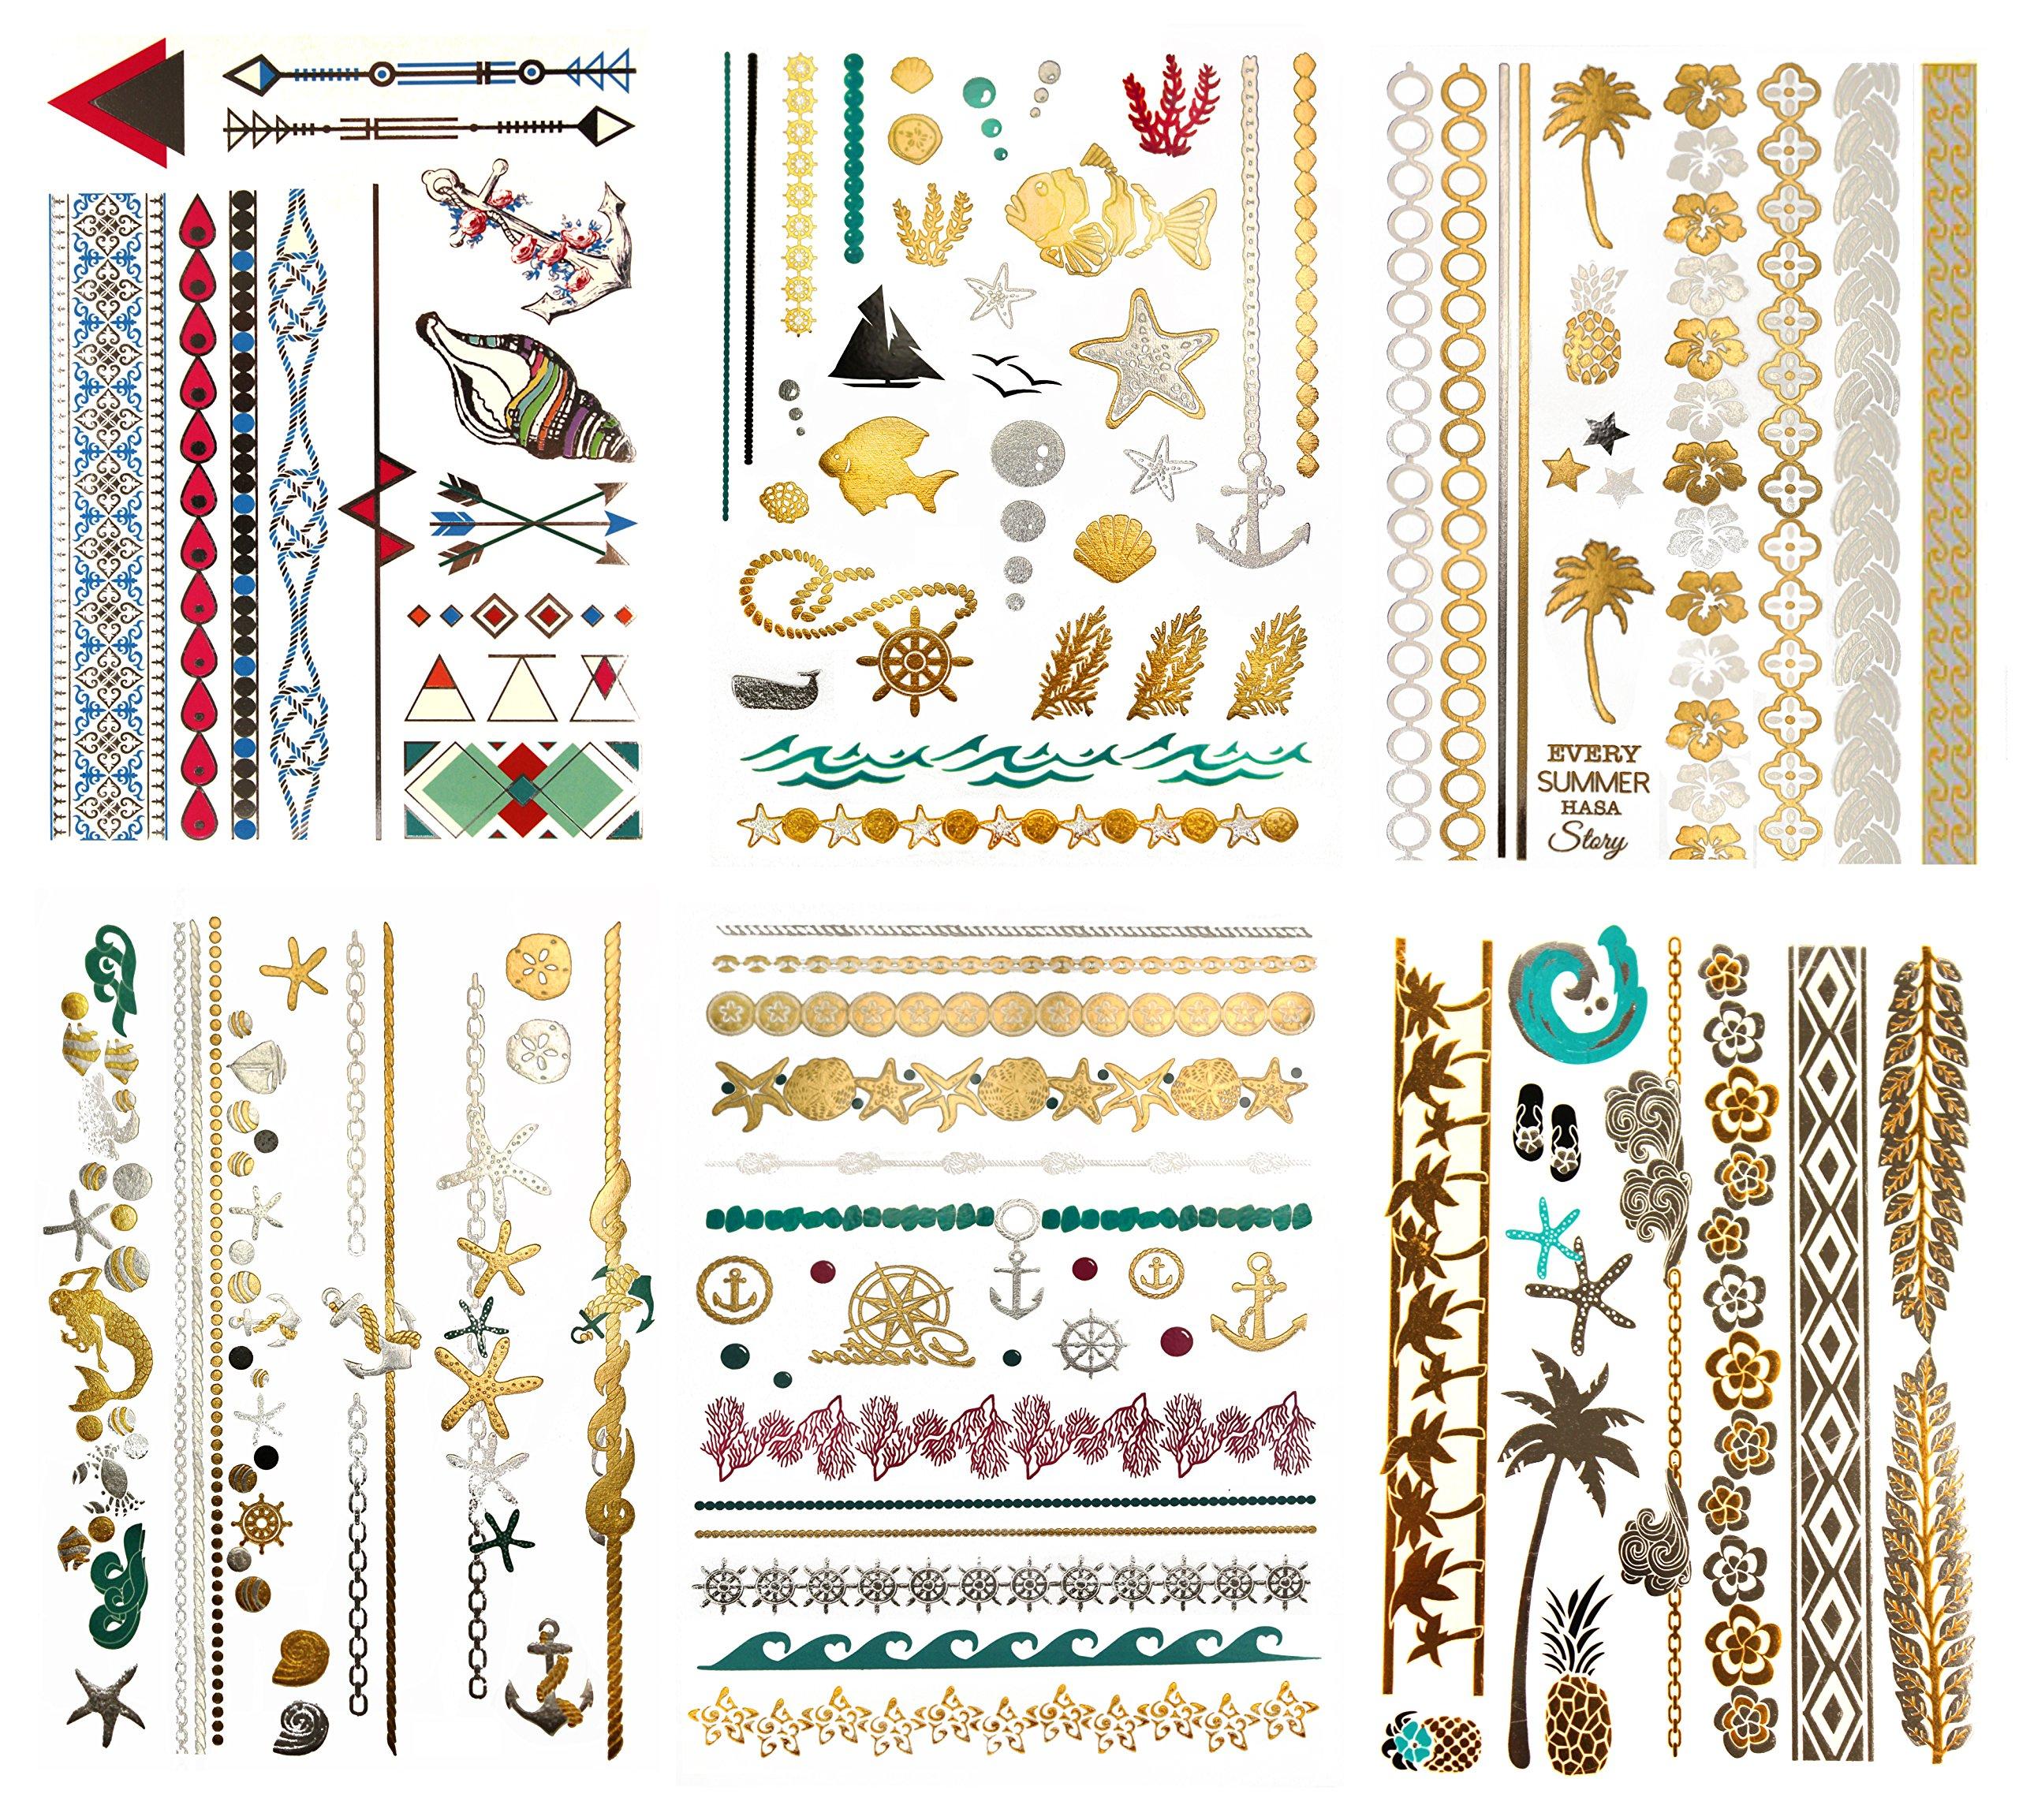 Metallic Color Hawaiian Temporary Tattoos - 75 Beach Sea Life Designs in Gold Silver Tropical Colors (6 Sheets) Terra Tattoos Alana Collection